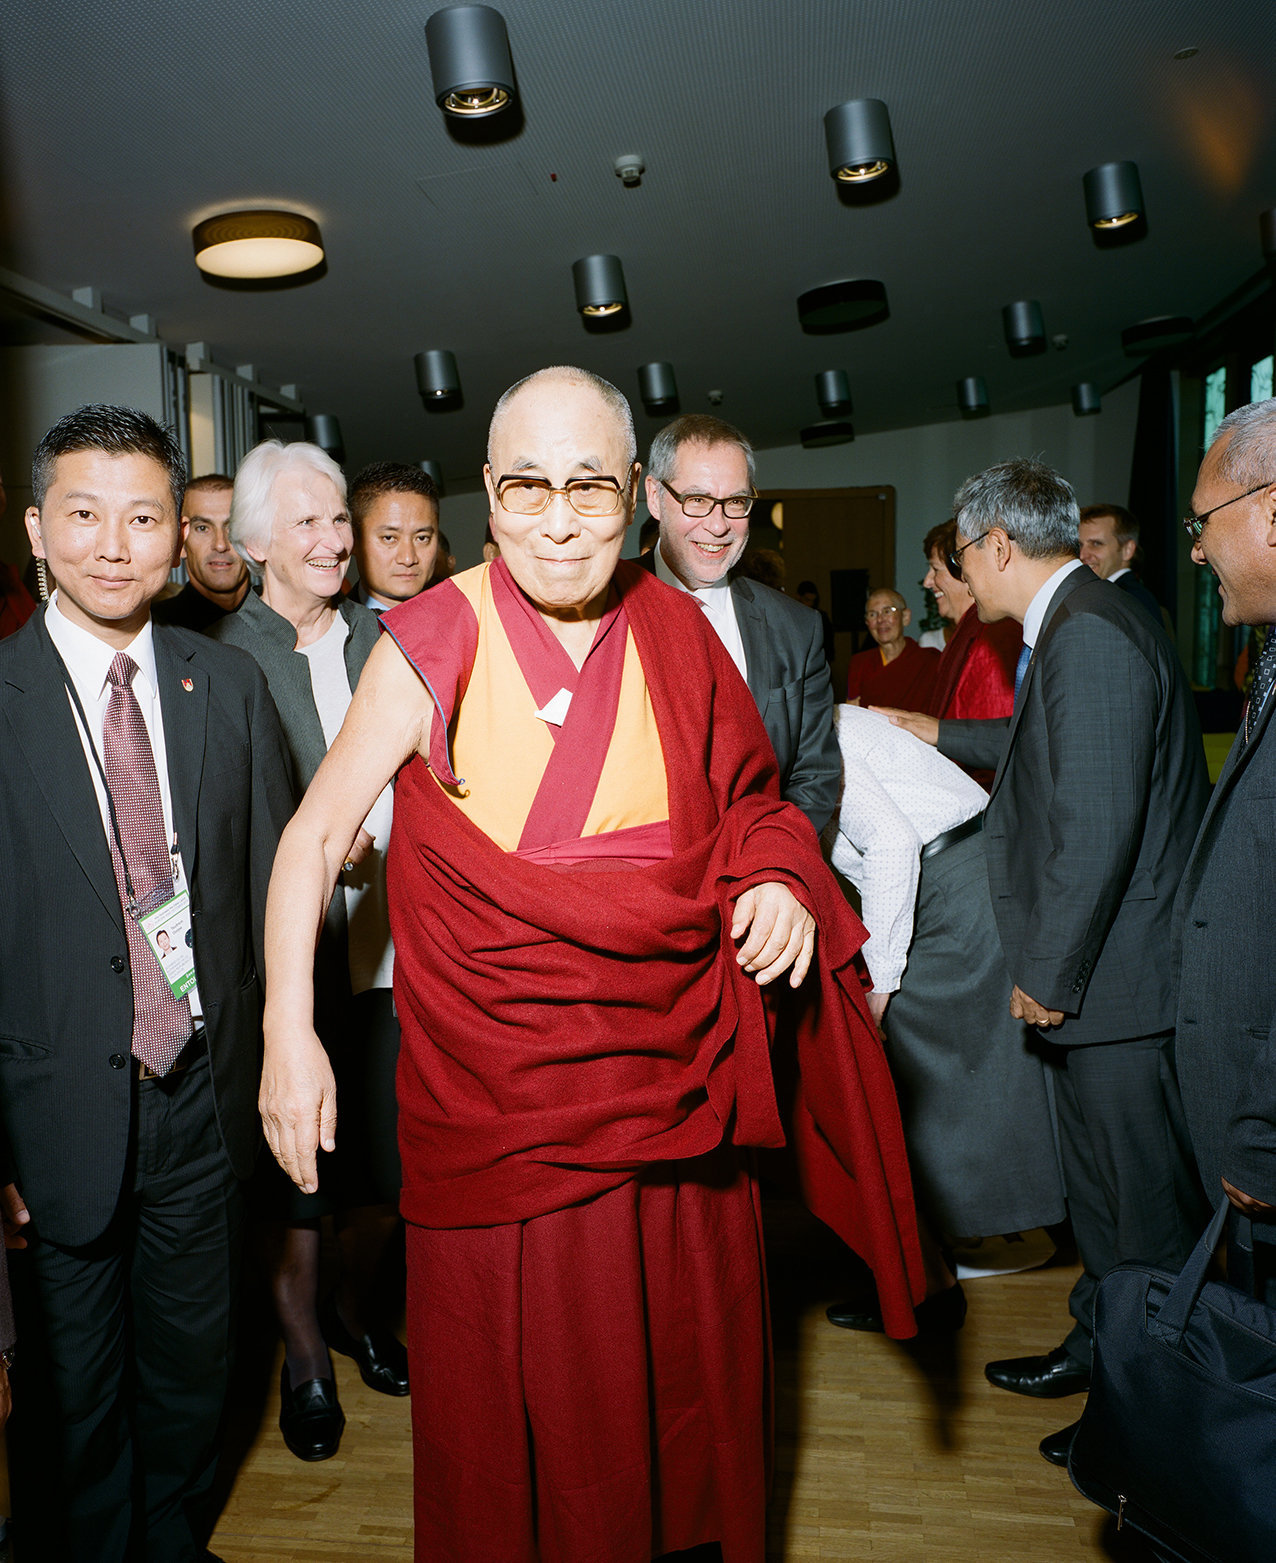 Dalai Lama for Bauart Architects